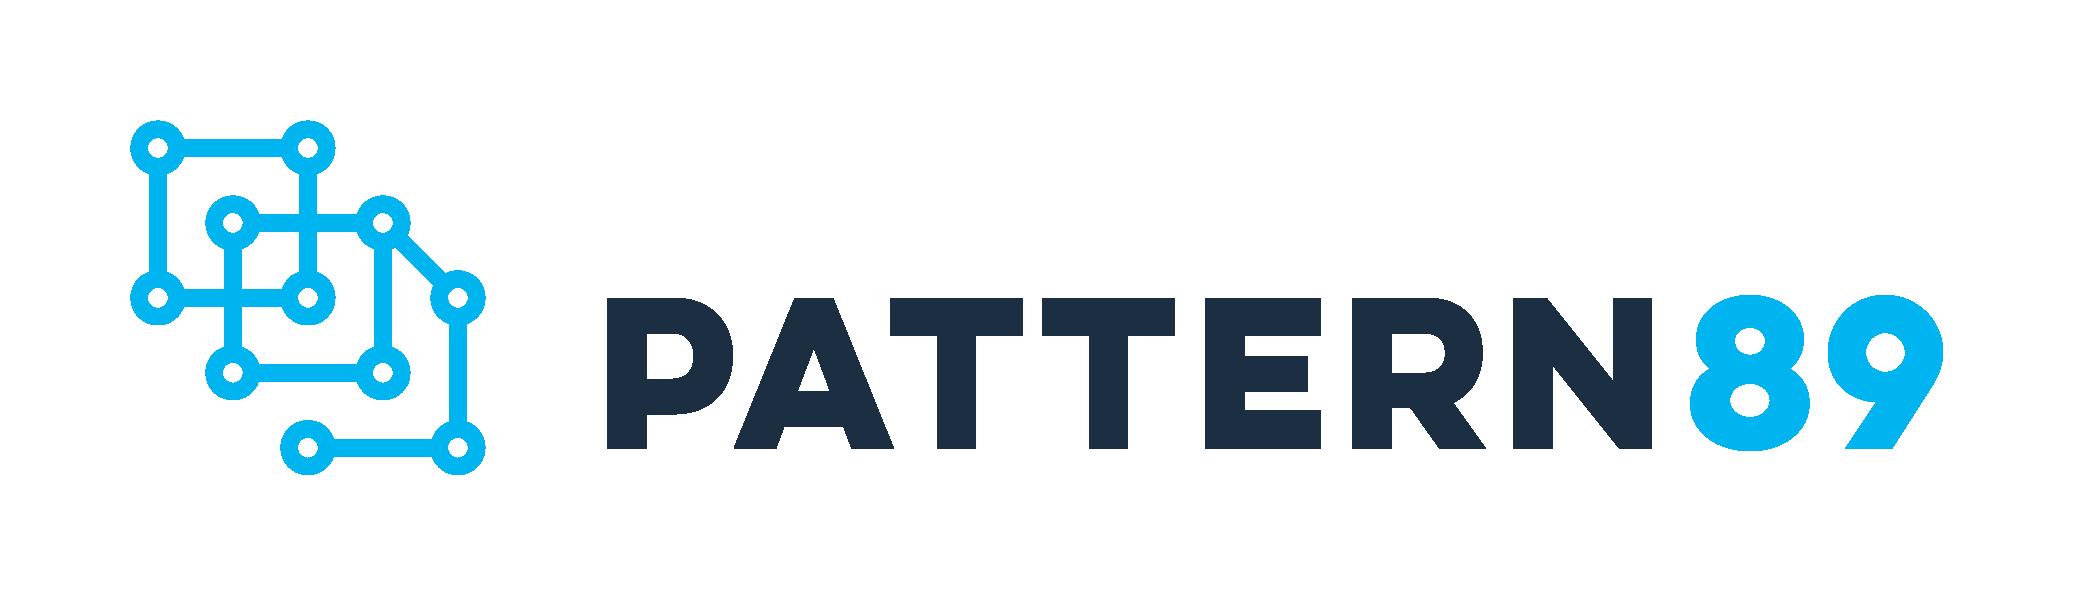 Pattern89_master-01.png